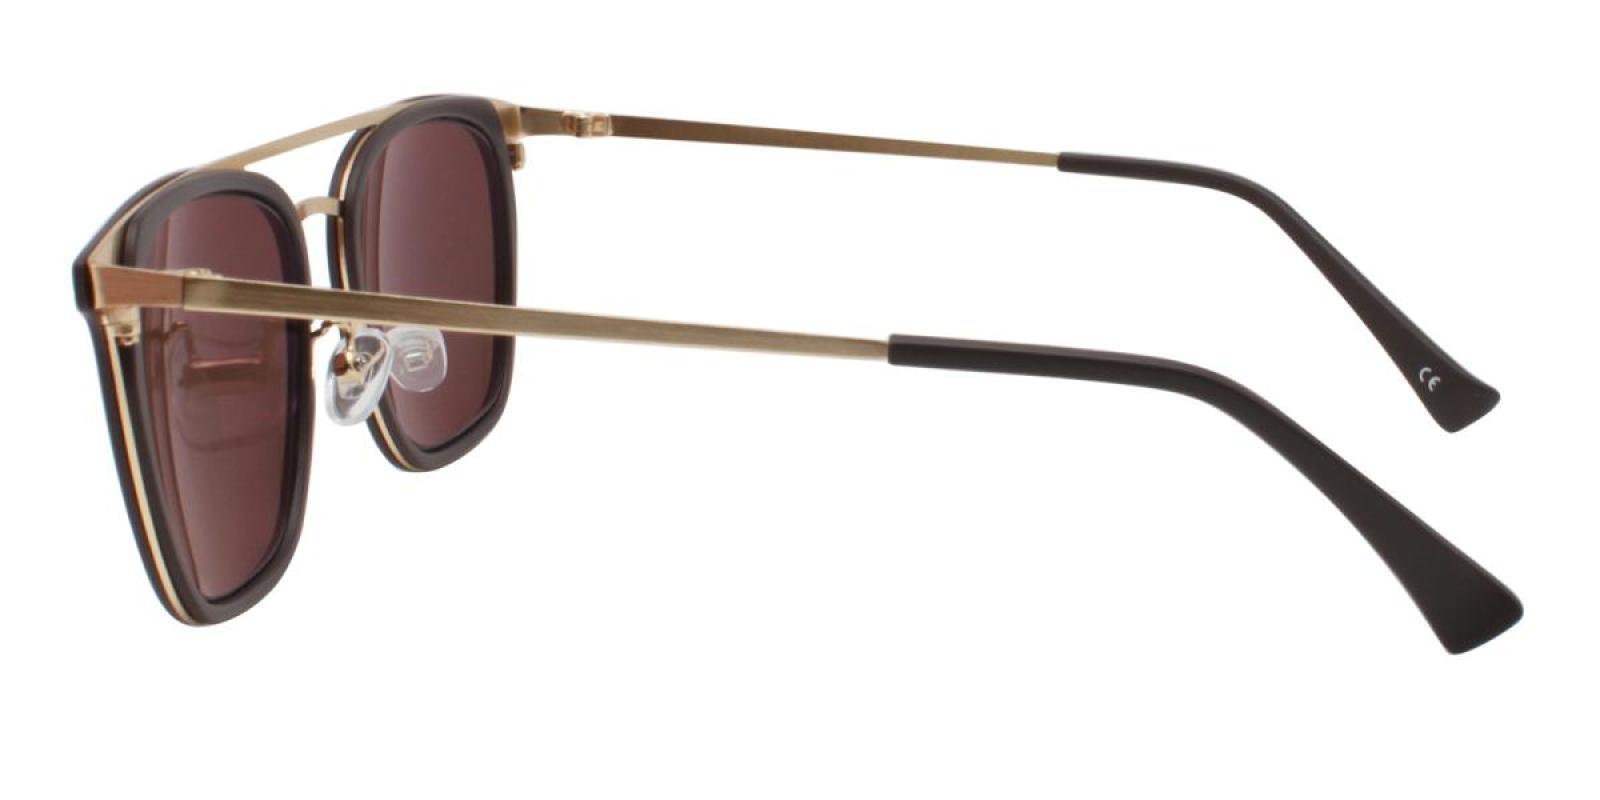 Seagual-Brown-Aviator-Metal / Combination / TR-Sunglasses-additional3